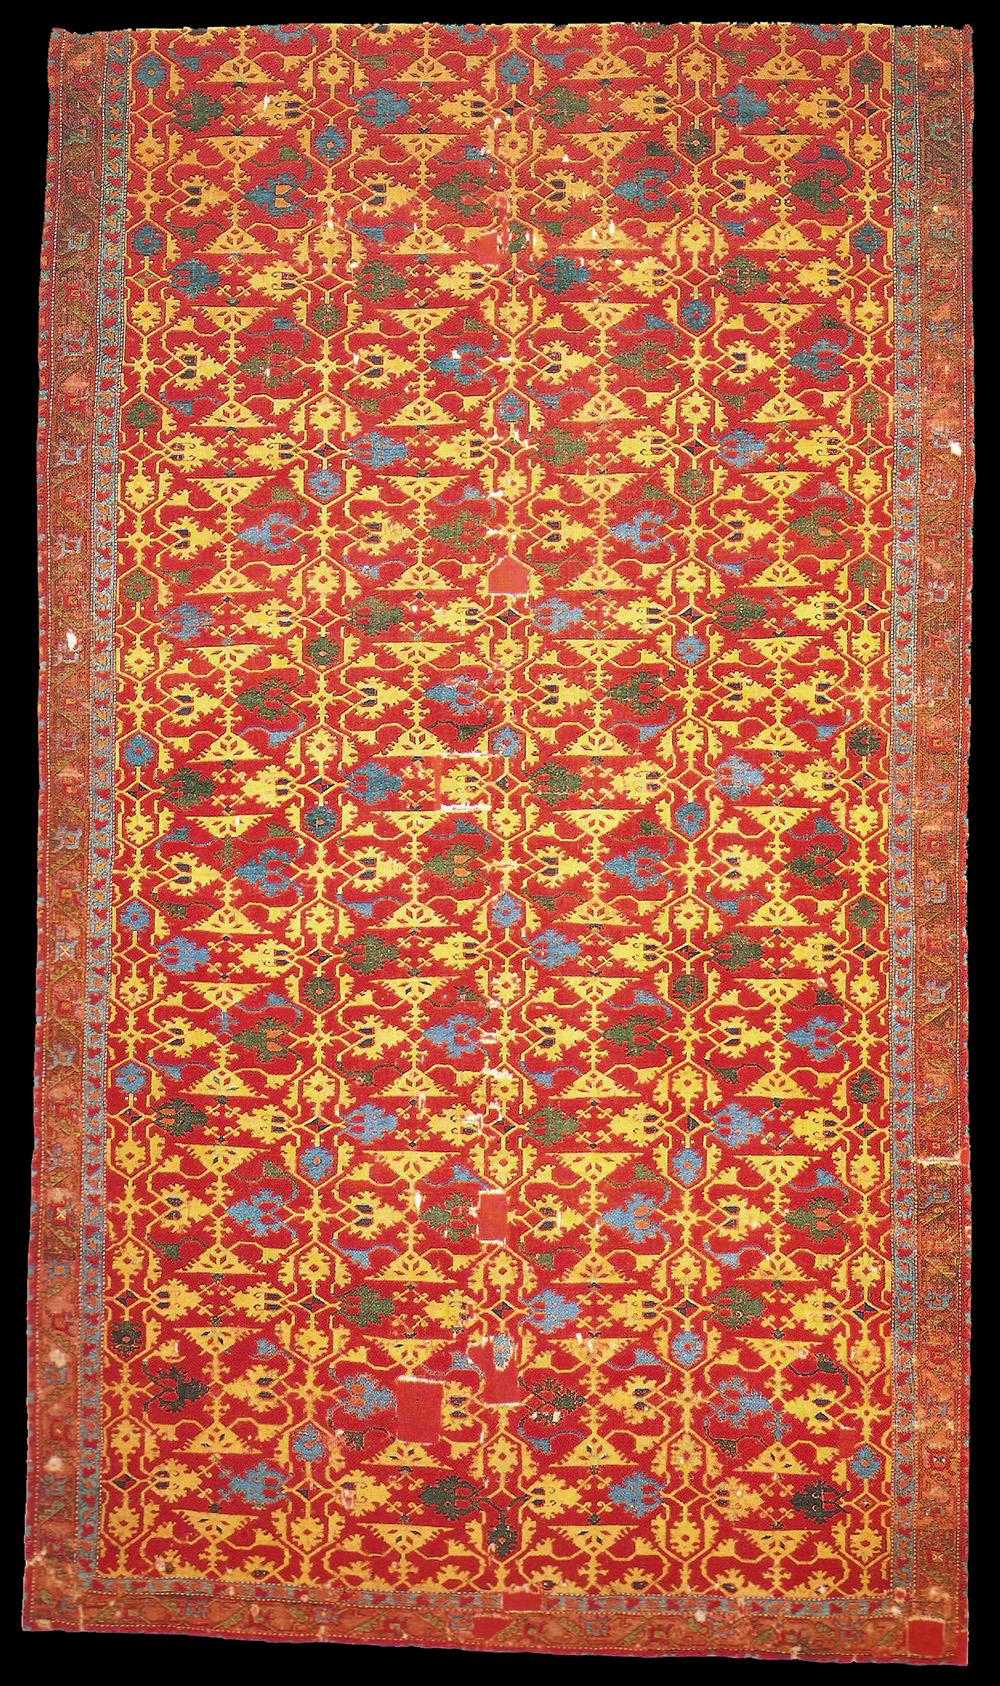 17th century Lotto type Ushak carpet, Western Anatolia